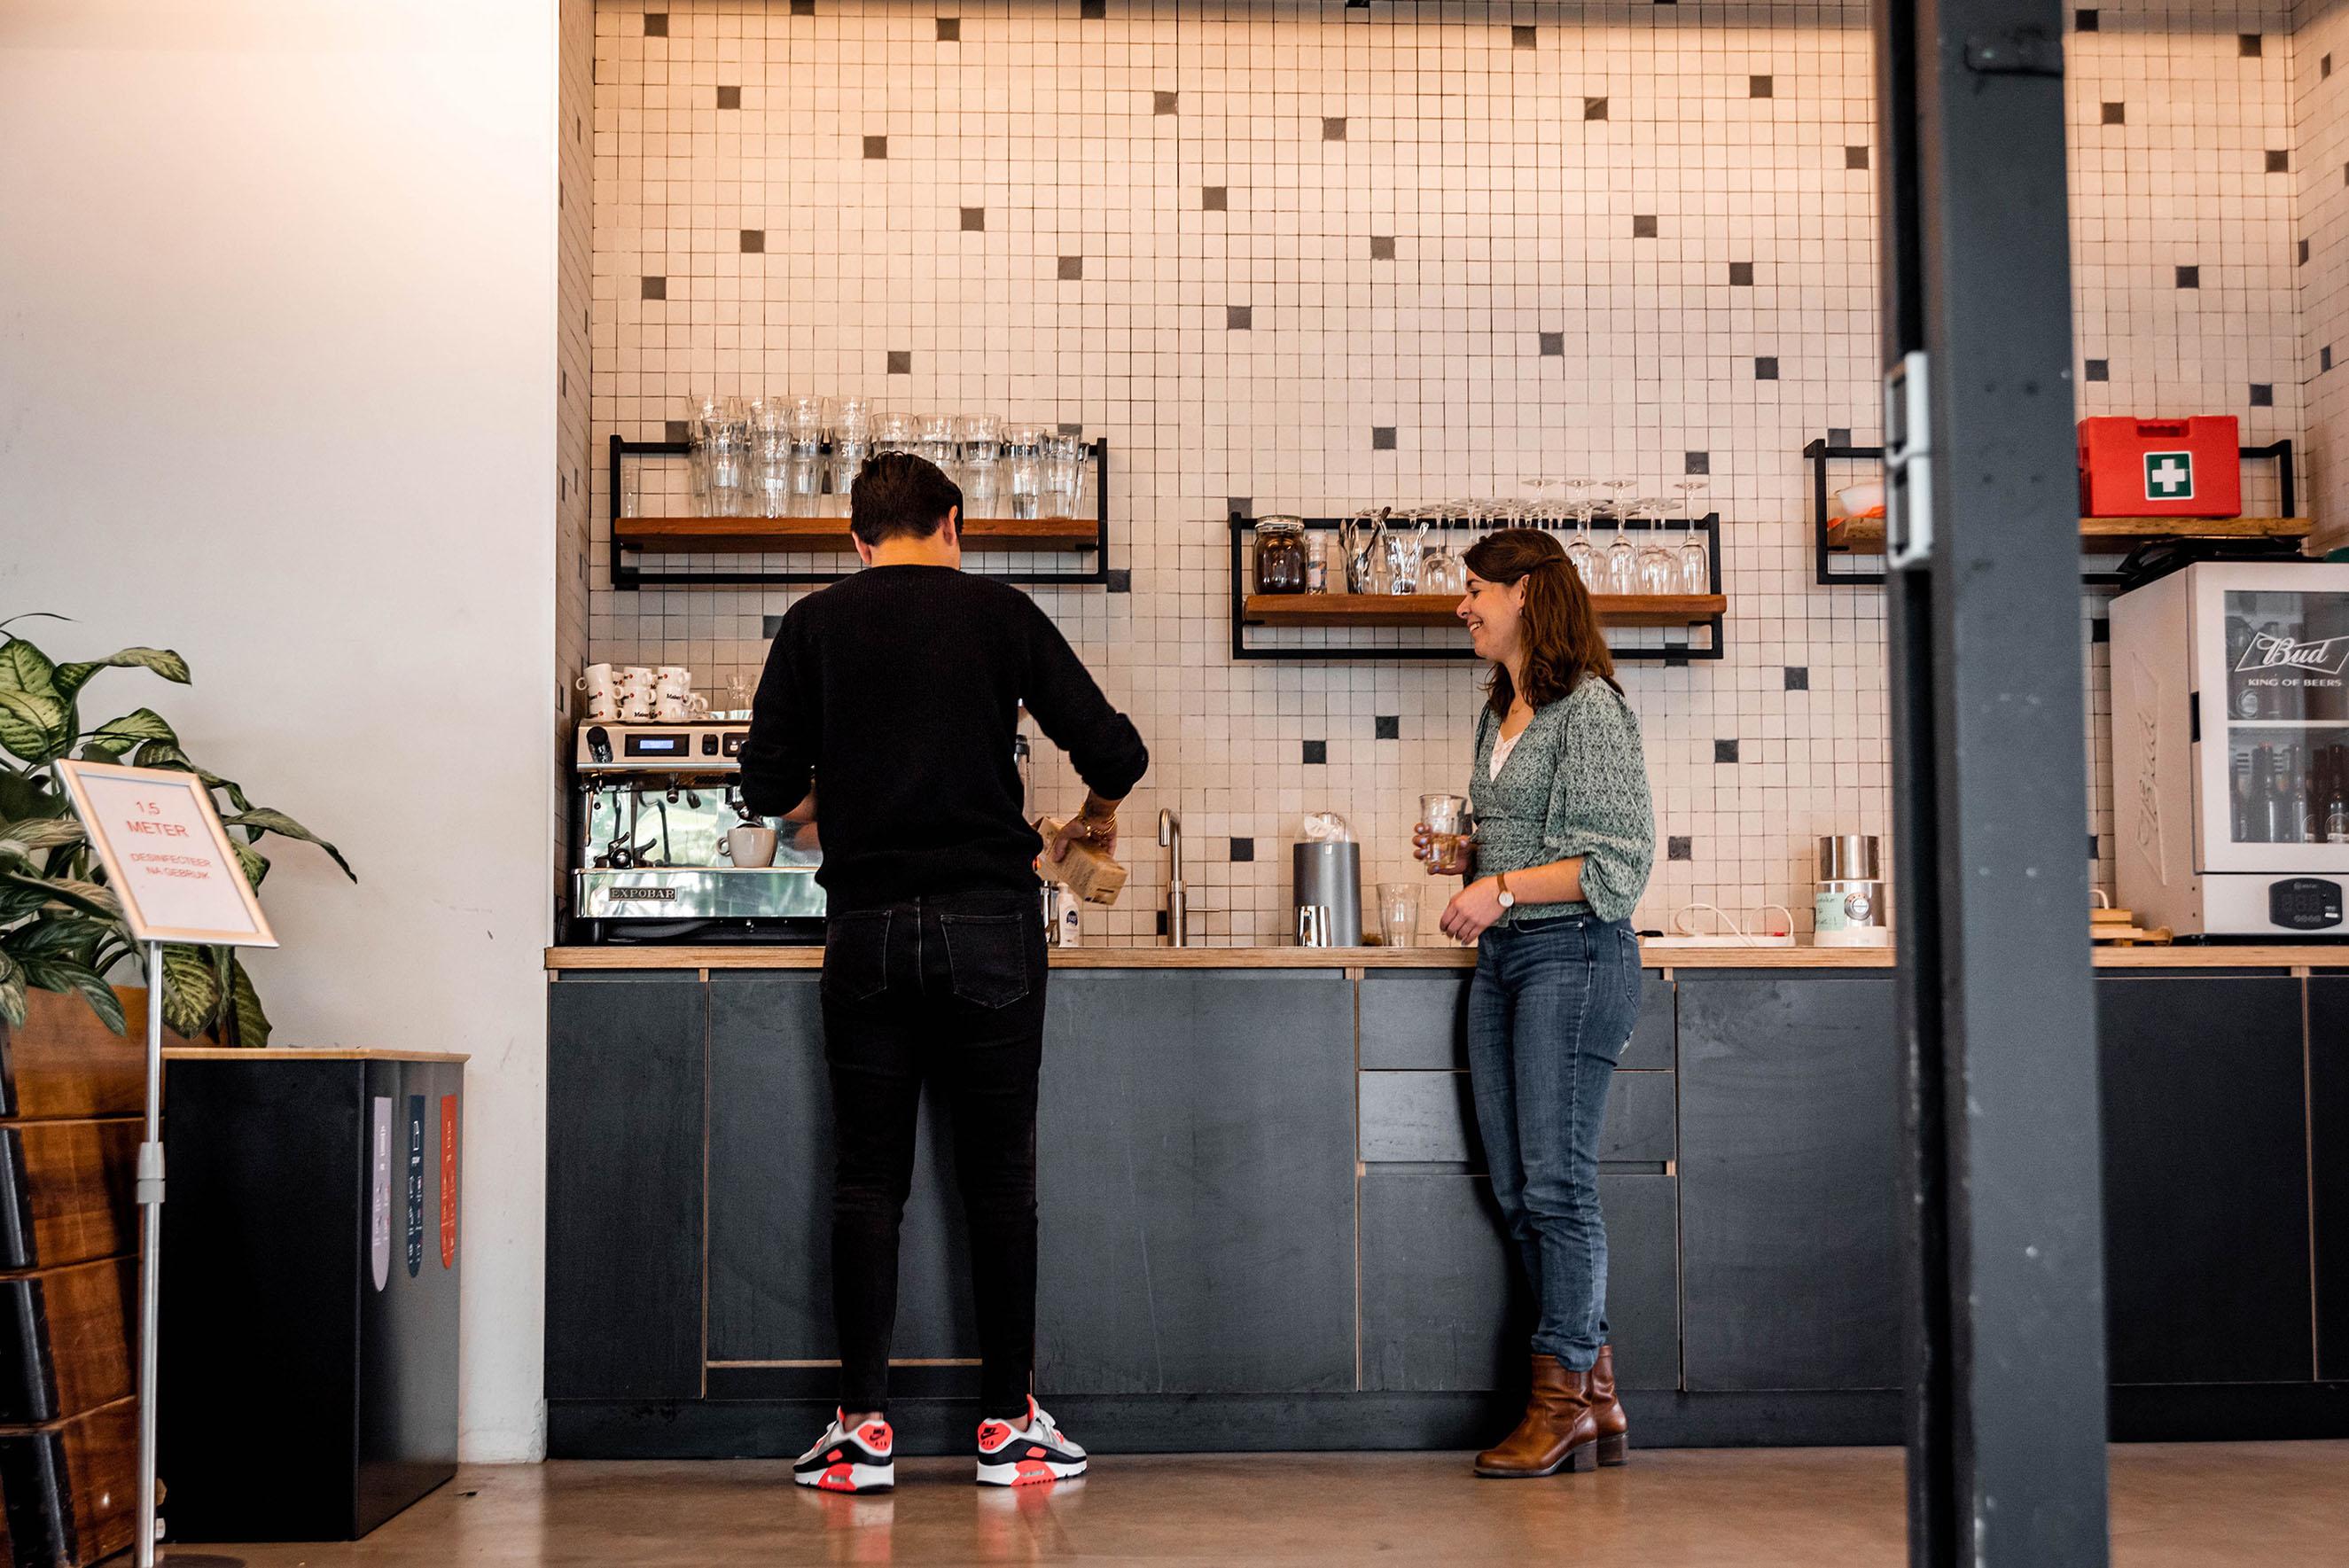 Makerlab koffiebar, twee collega's drinken koffie